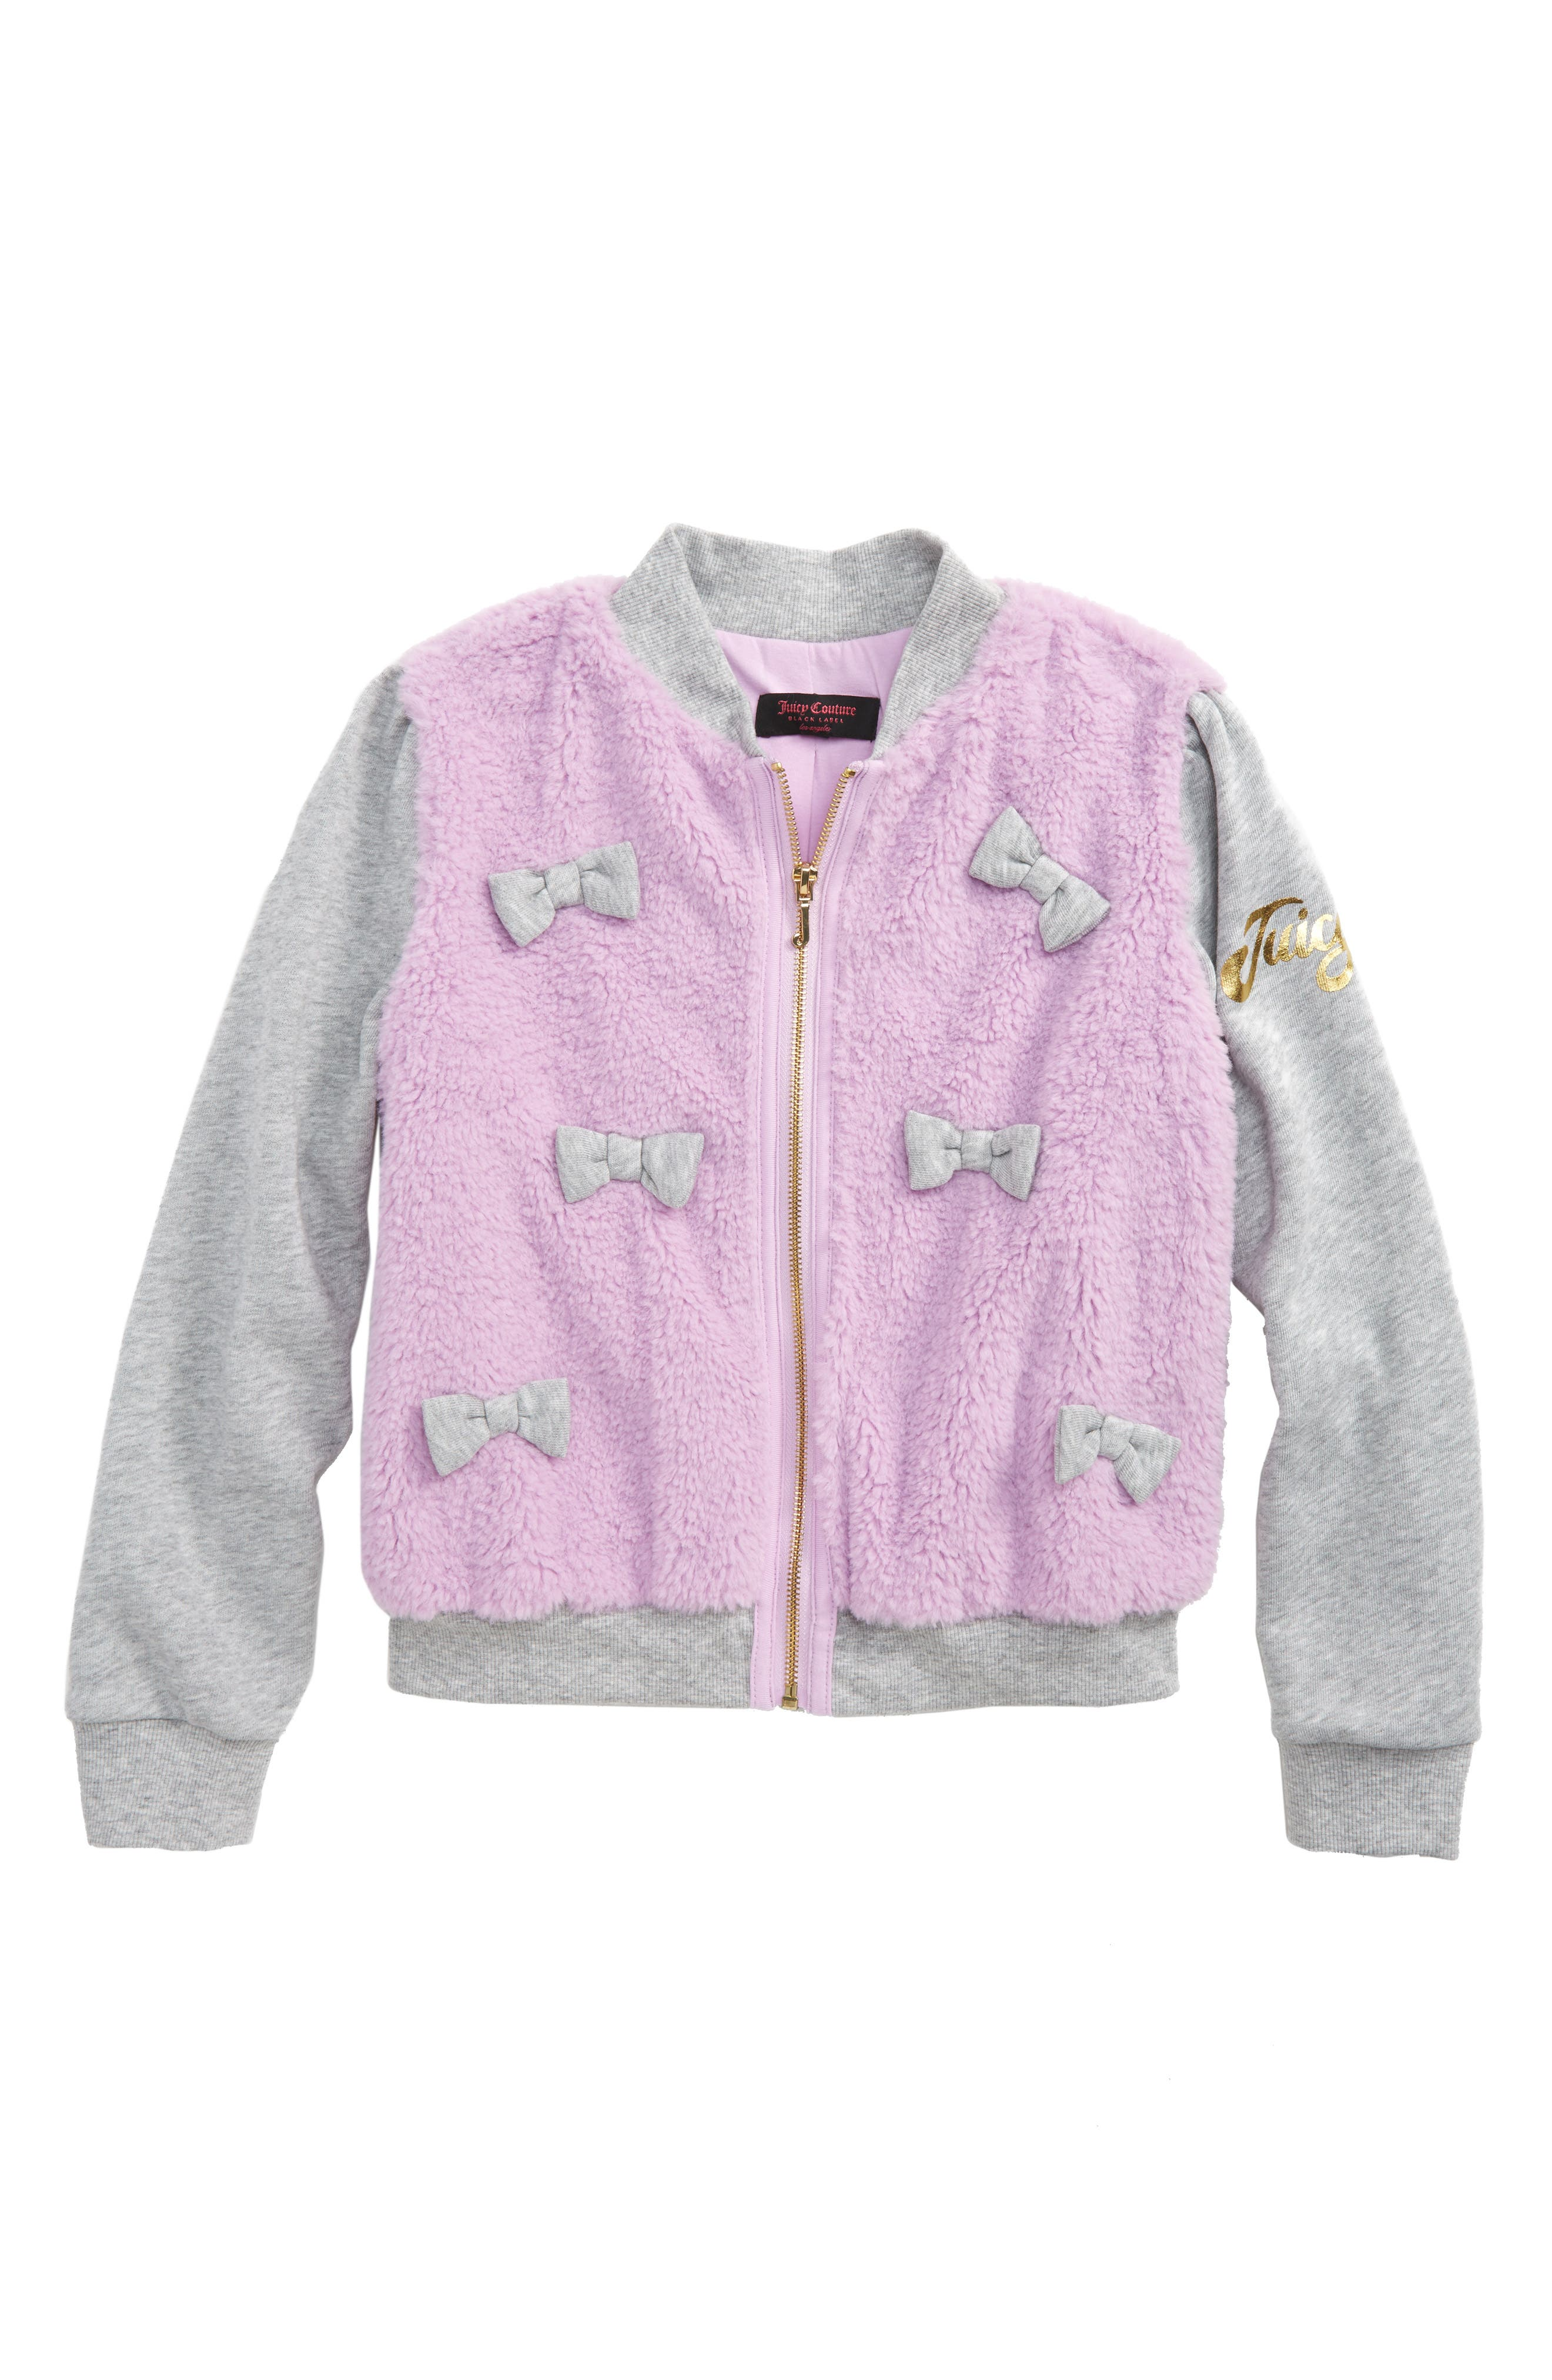 Main Image - Juicy Couture Mixed Media Bomber Jacket (Big Girls)